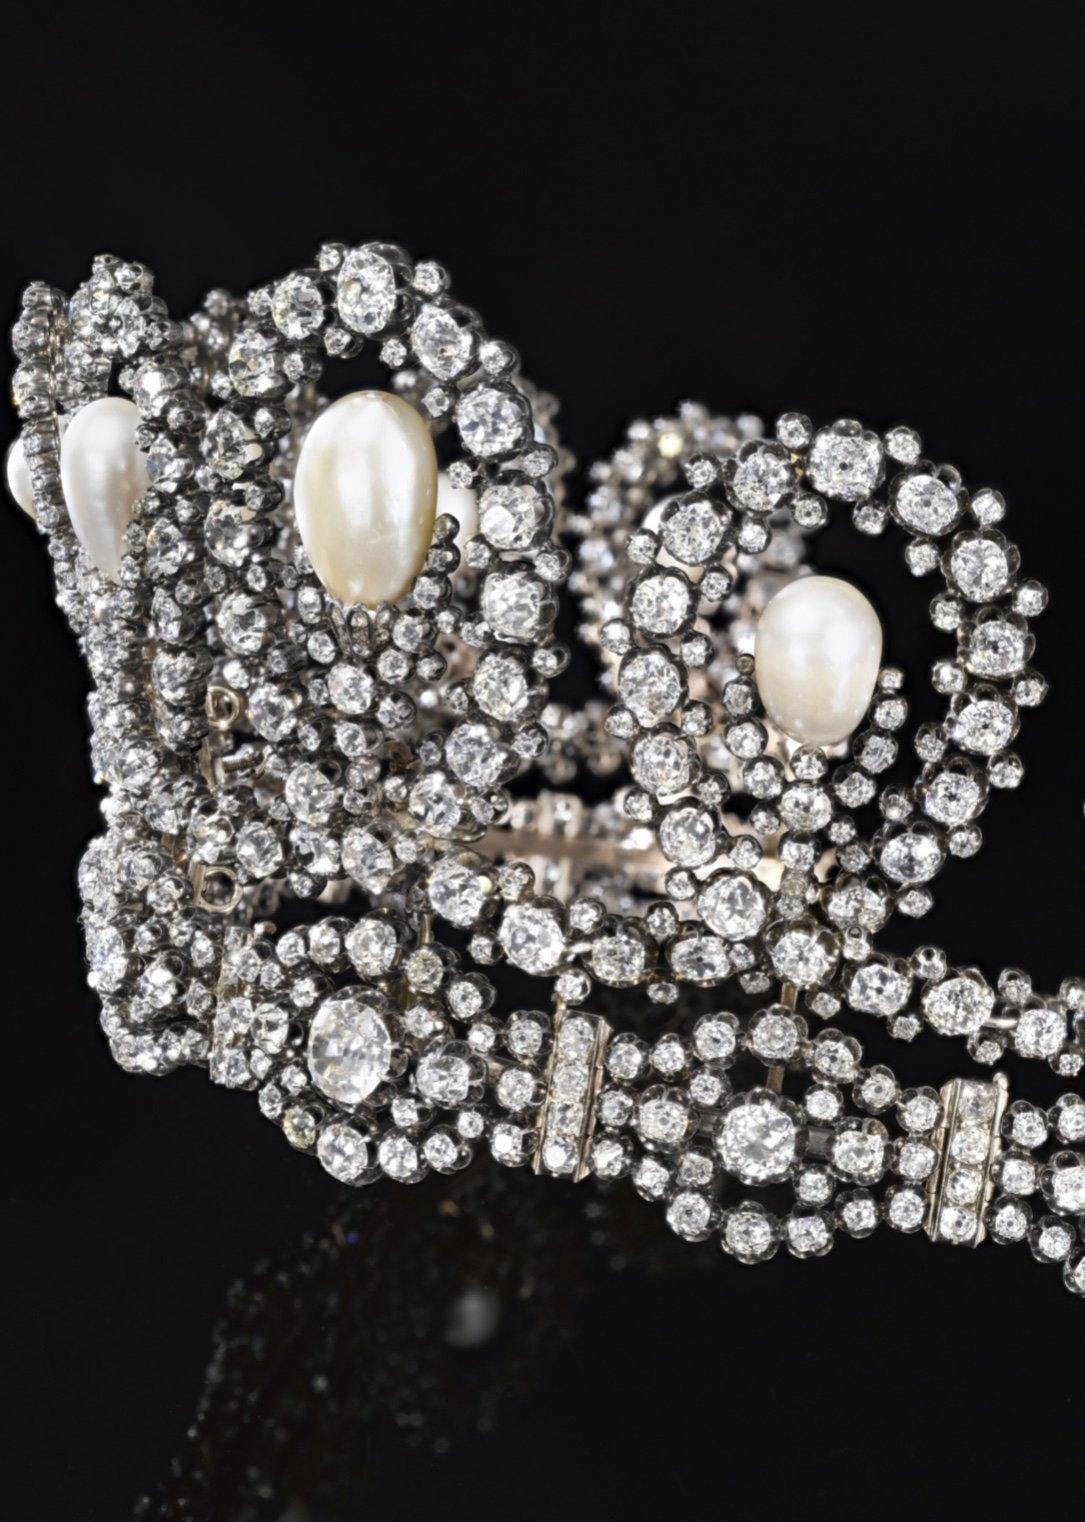 На аукционе Sotheby's продадут королевскую тиару с бриллиантами (фото)